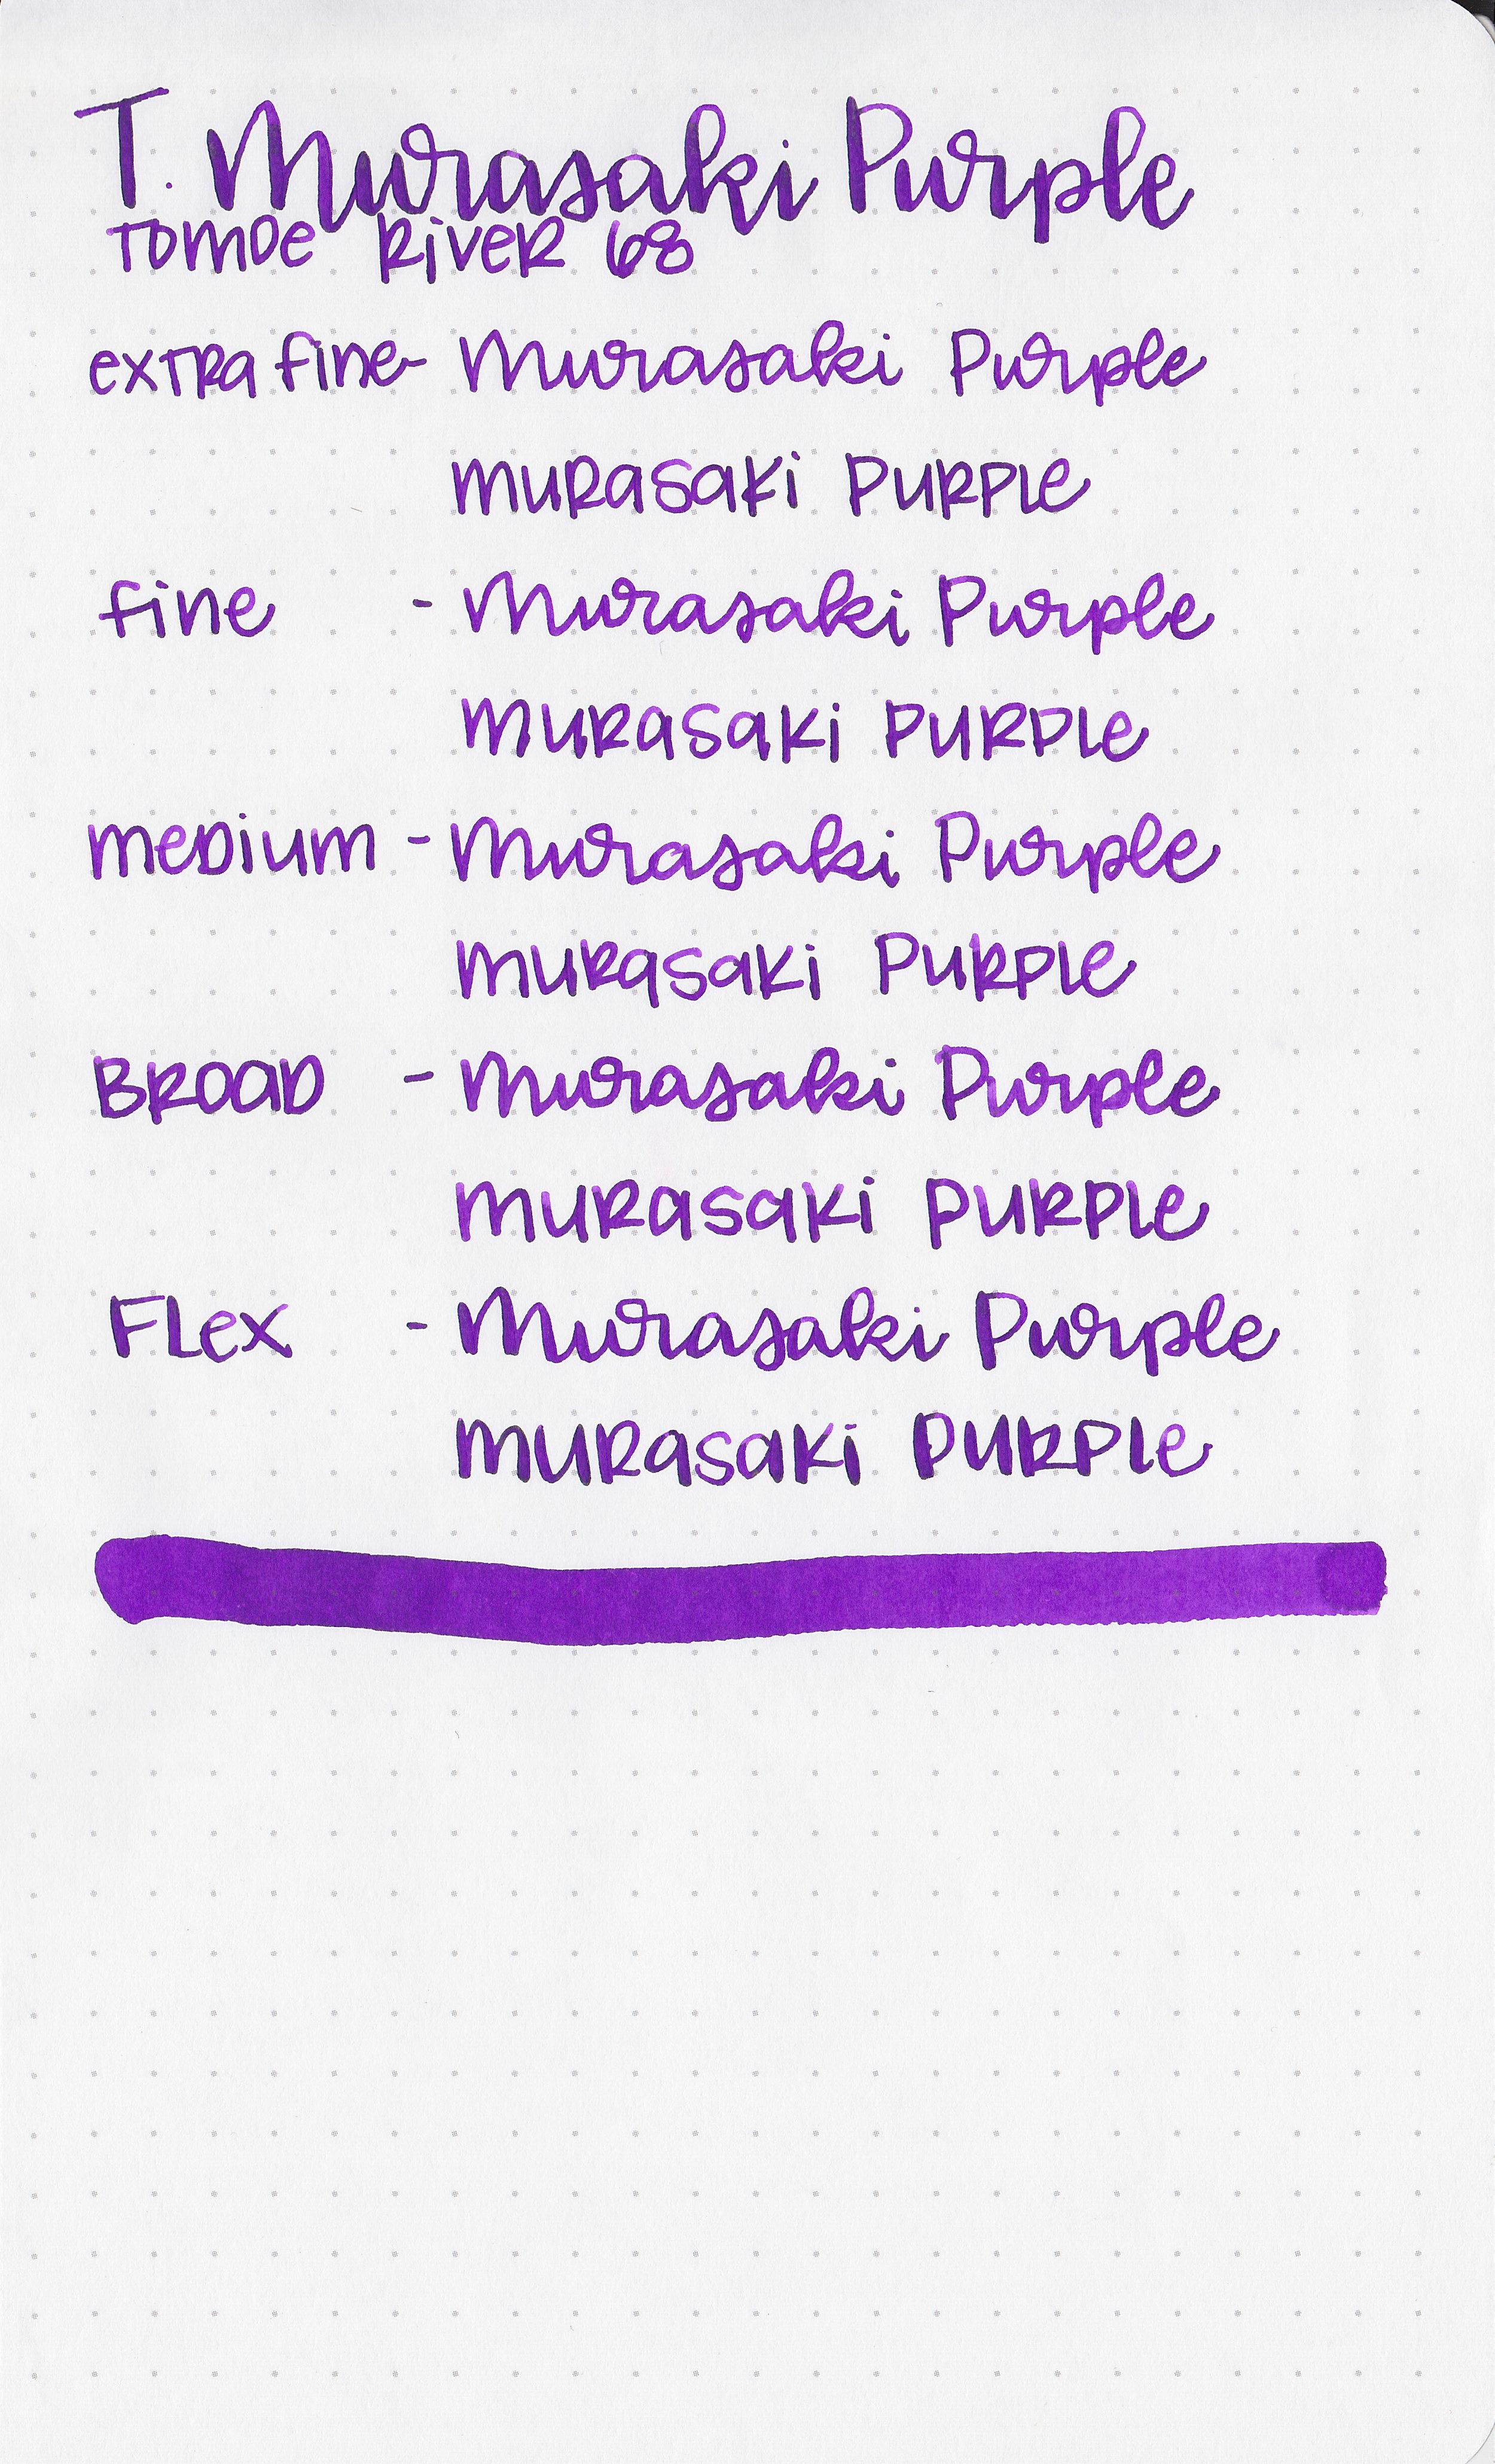 tac-murasaki-purple-9.jpg